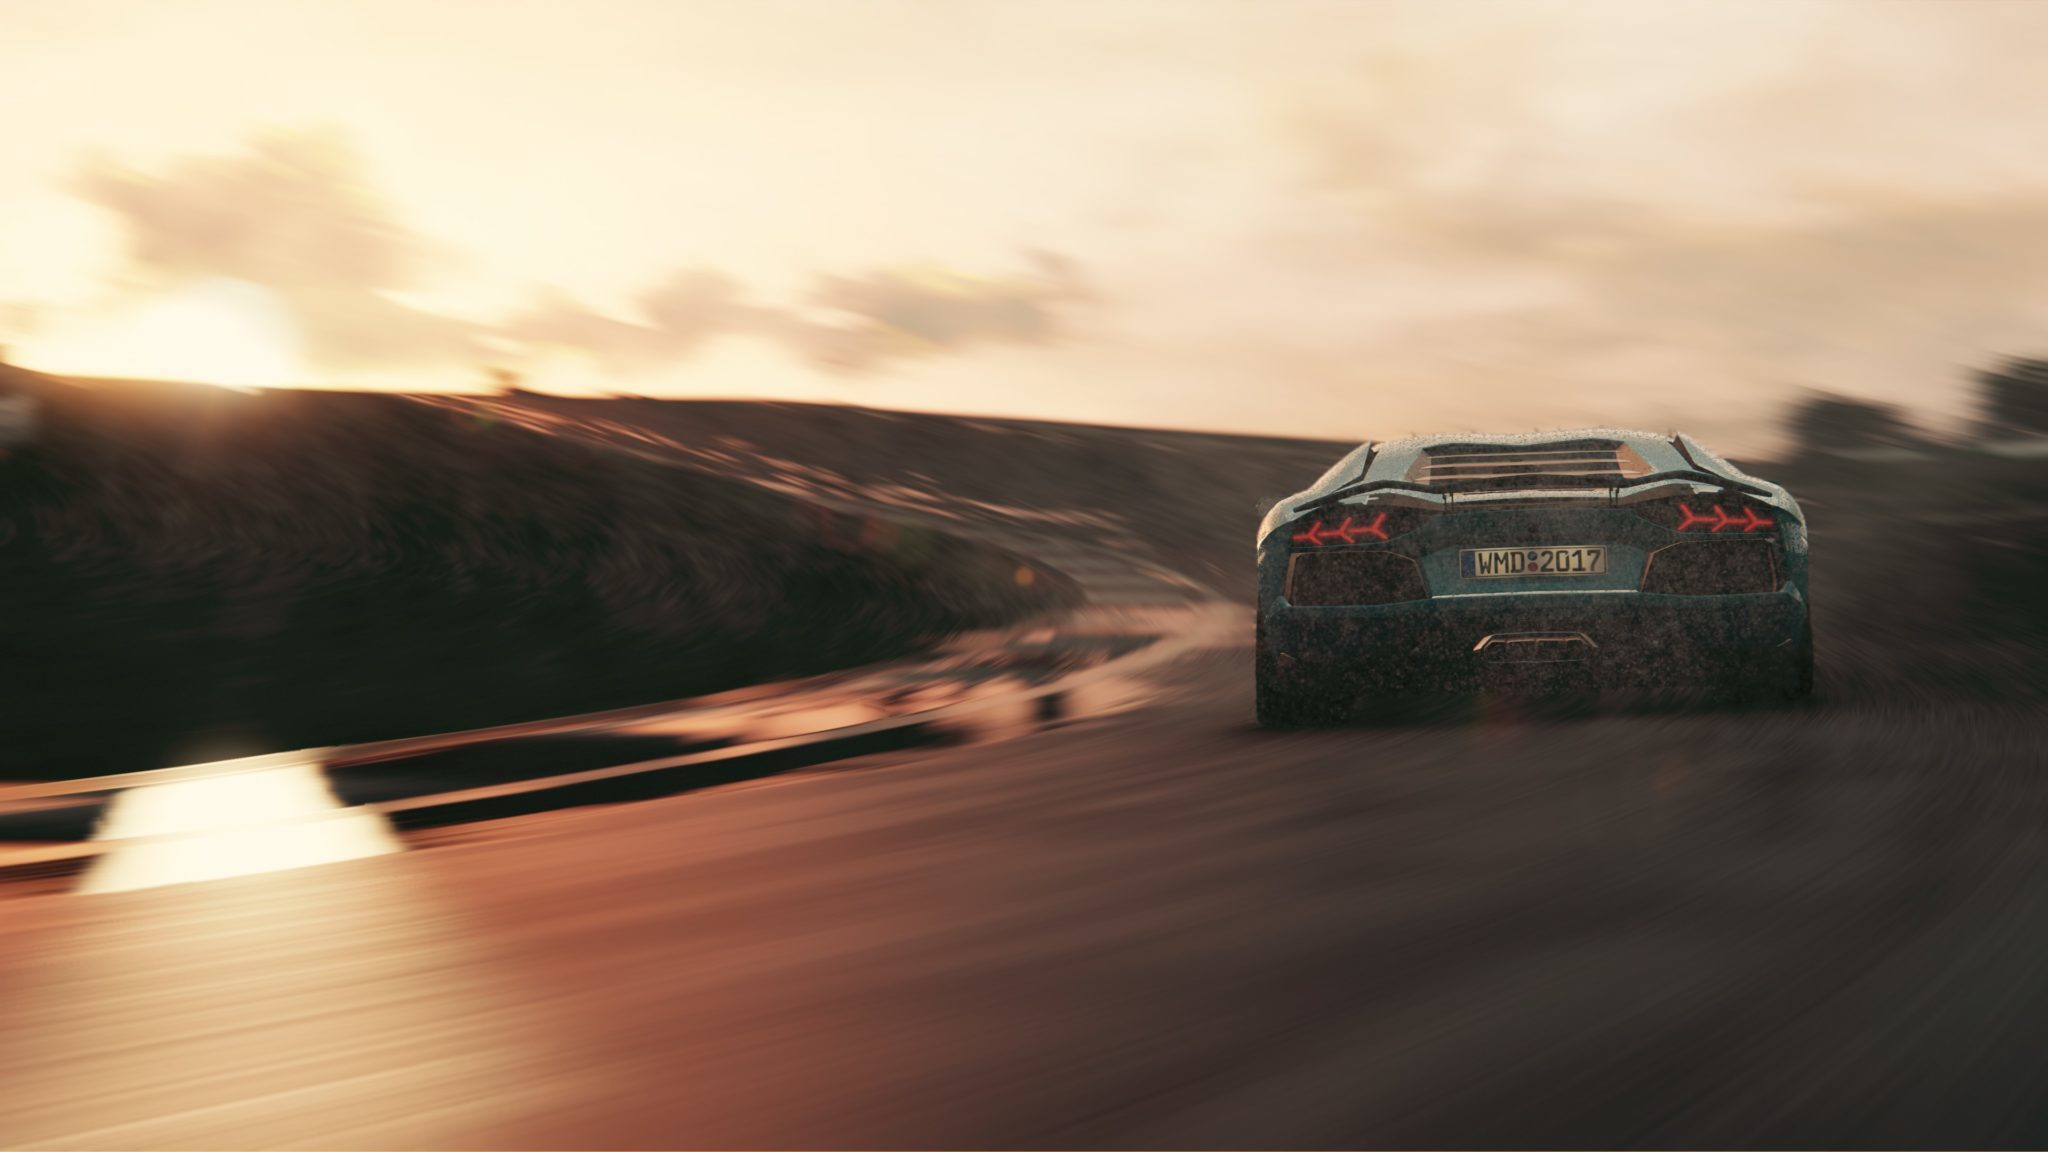 Project-CARS-2-Lamborghini-Aventador-FlyPT.jpg